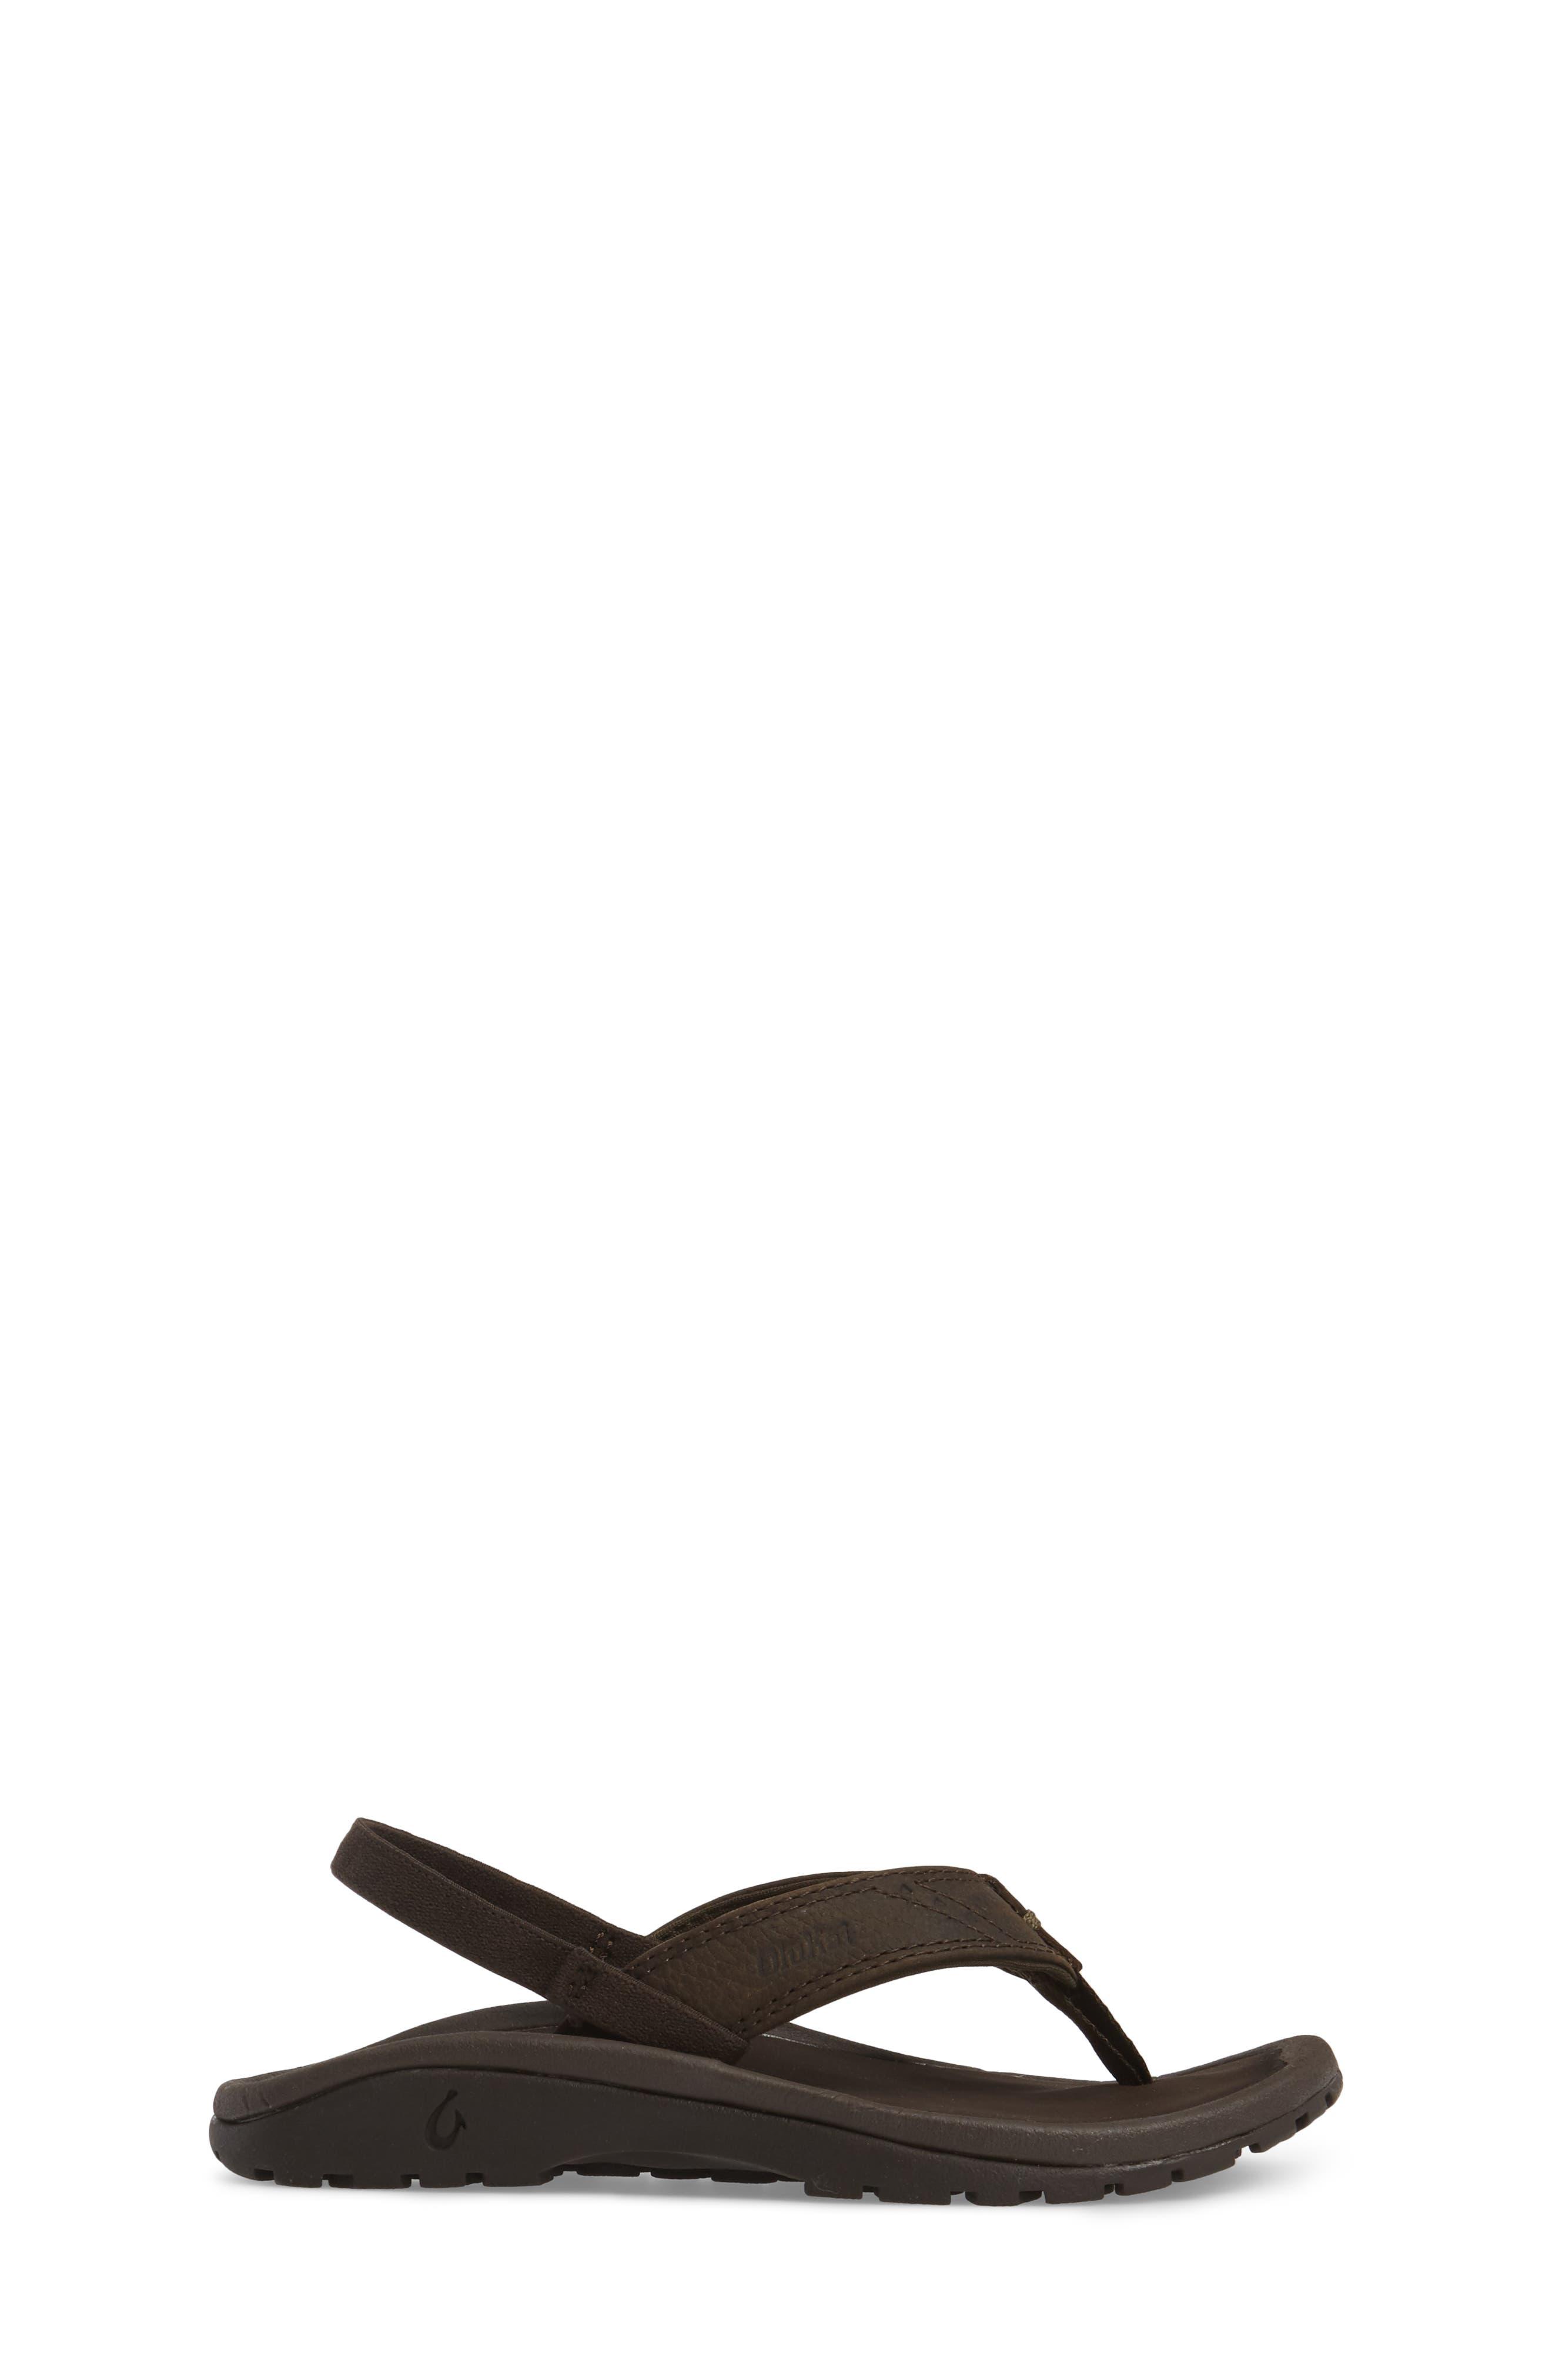 Alternate Image 3  - OluKai Nui Leather Sandal (Toddler)